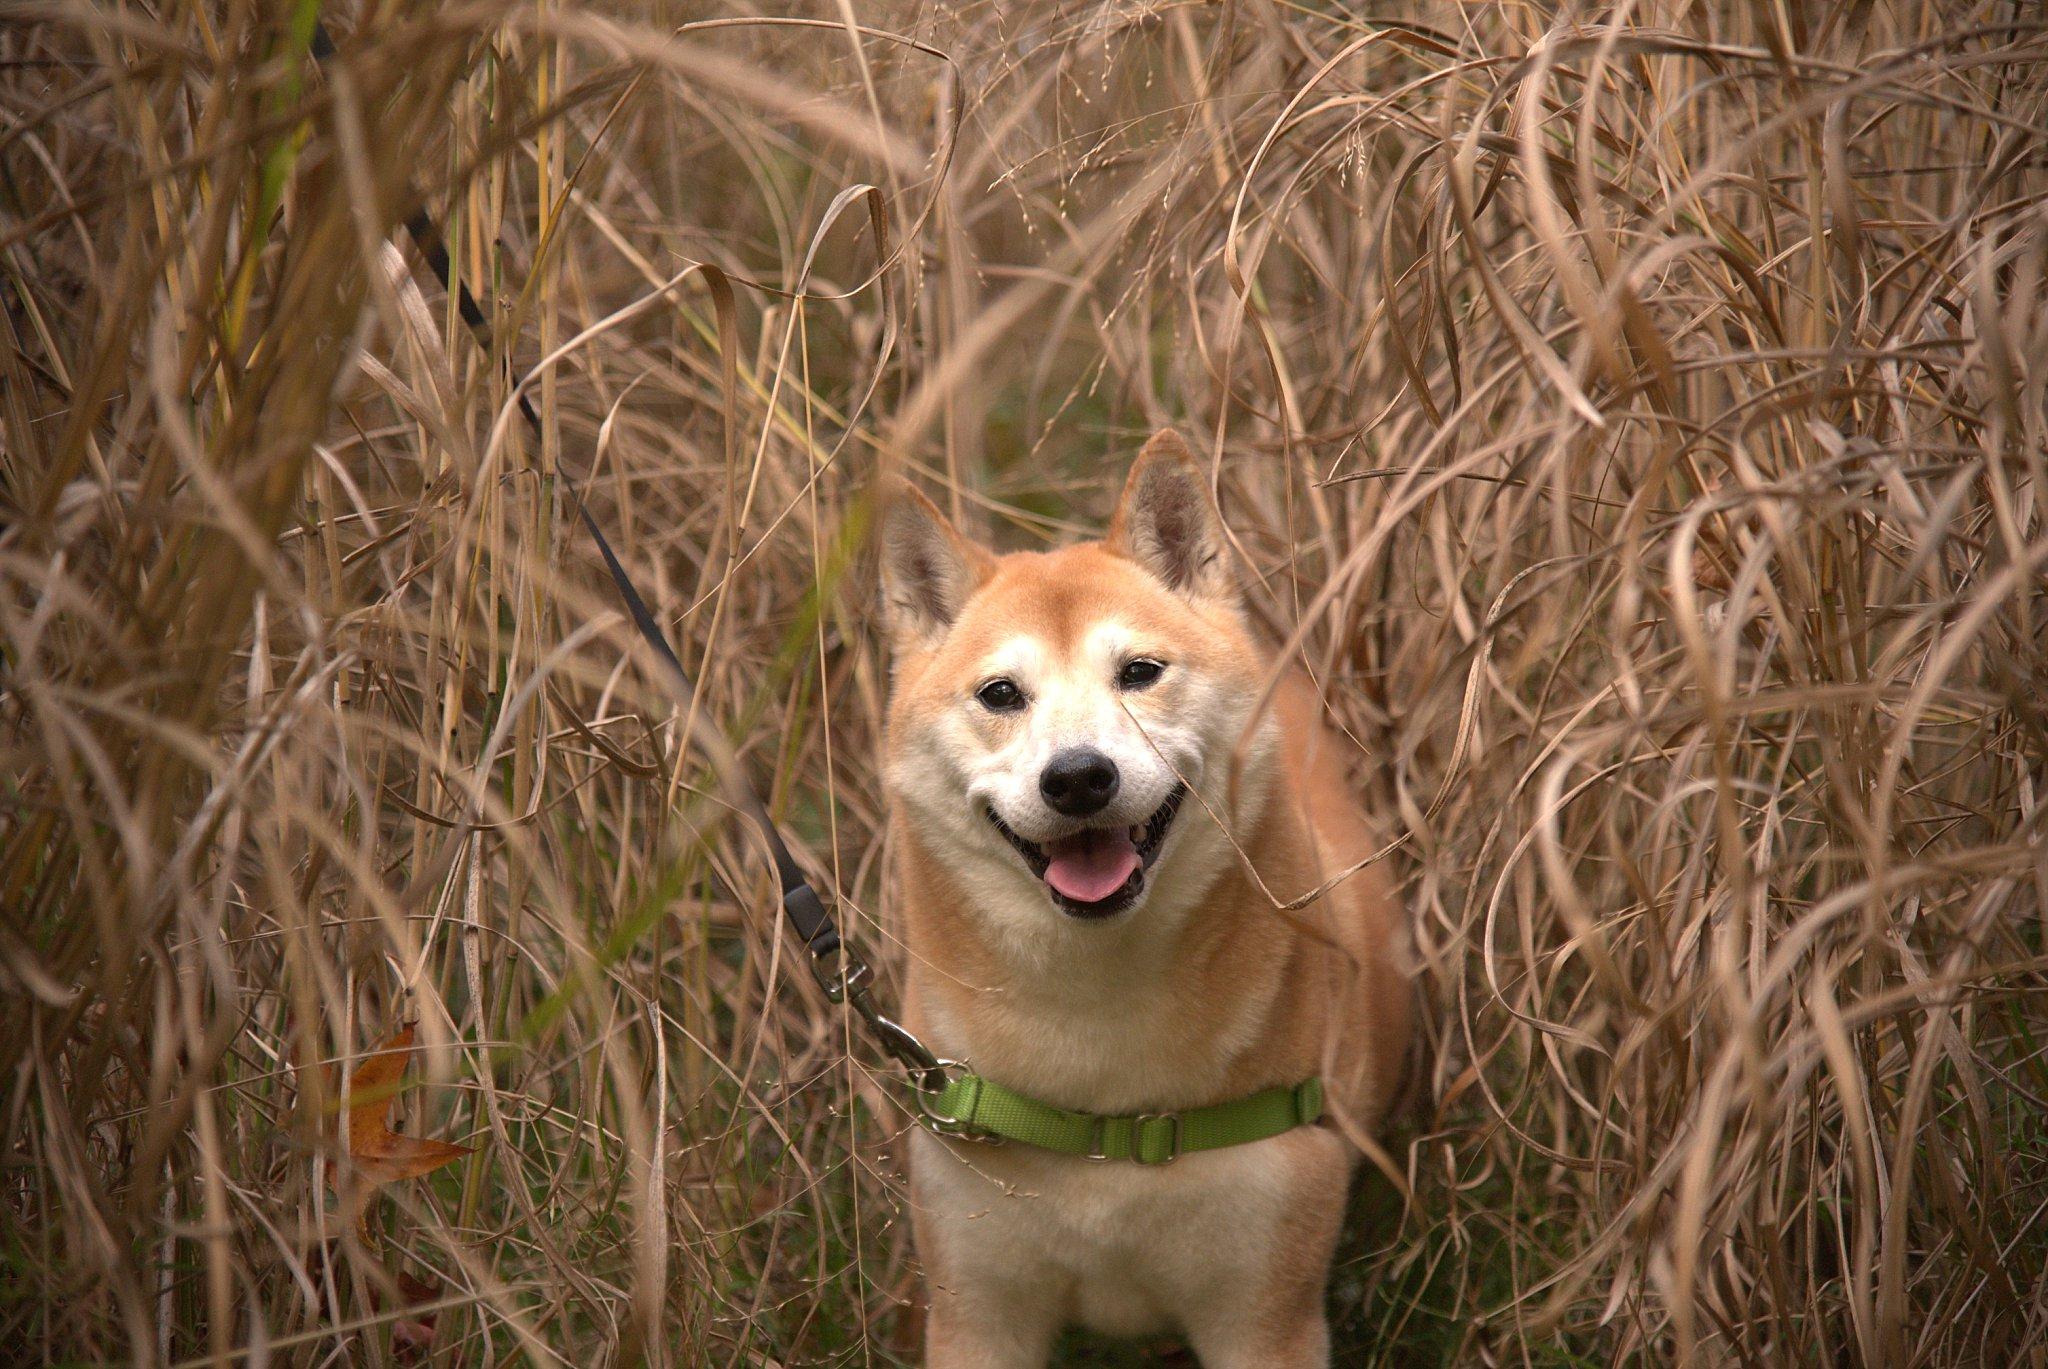 raw image of Shiba Inu in tall dead grass